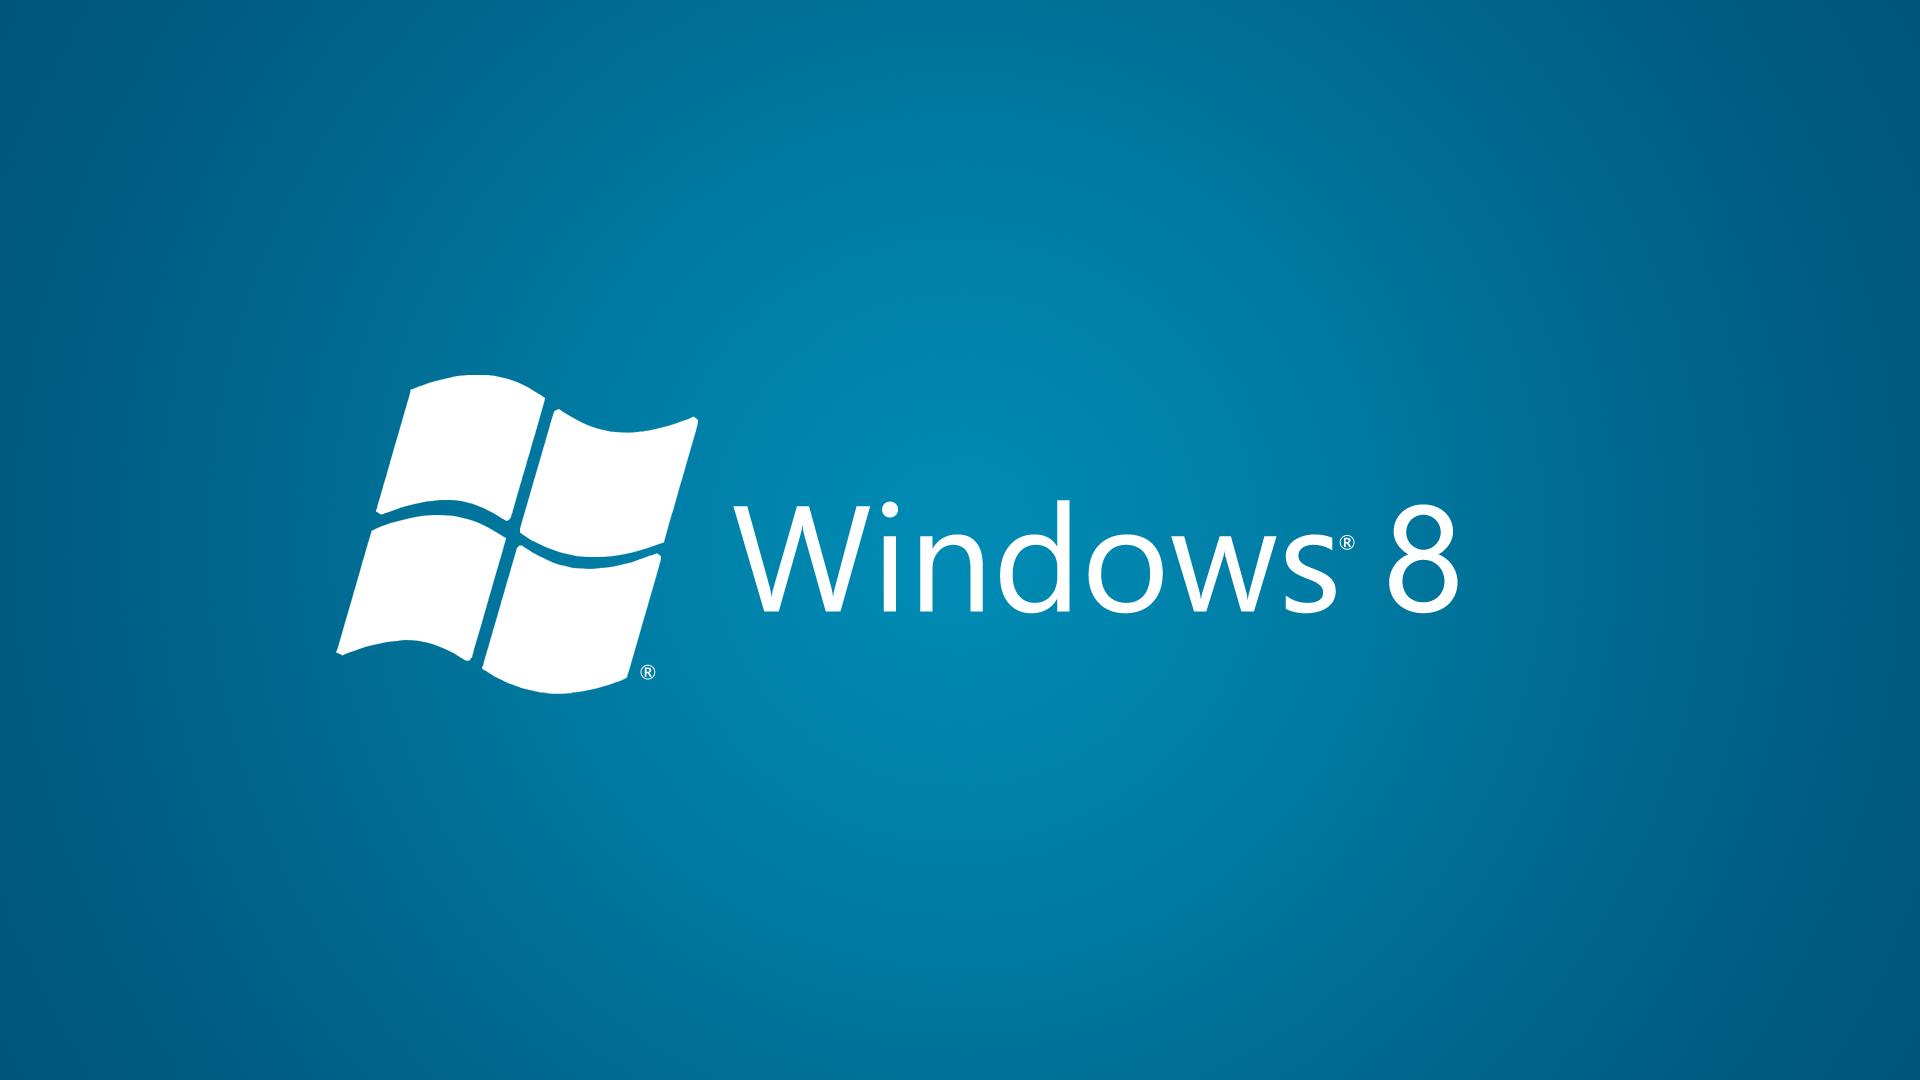 windows 8 wp 1920x1080 - photo #12